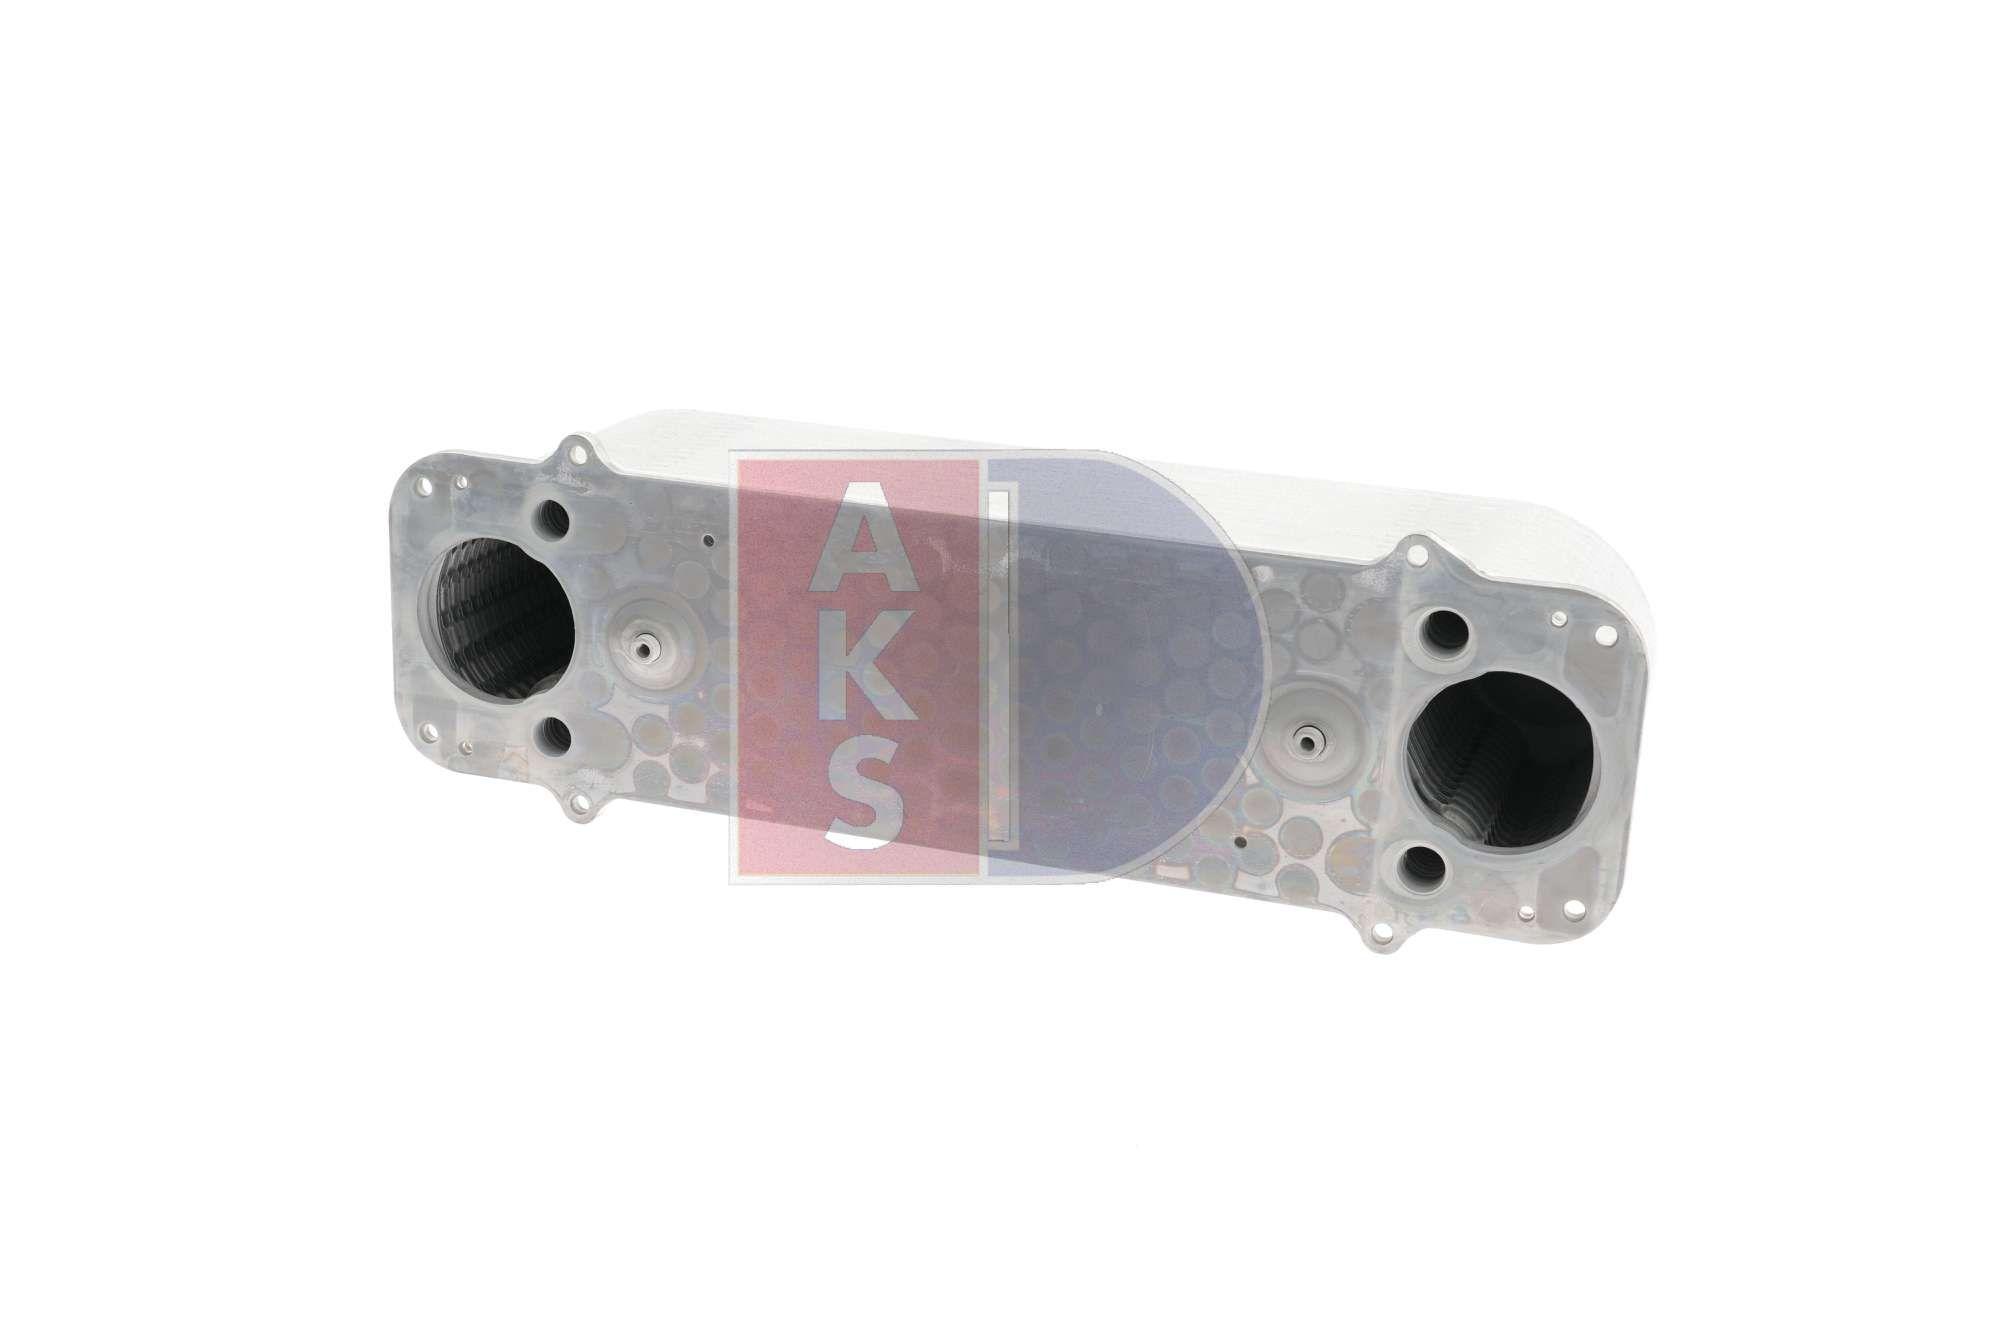 Comprar Intercooler de AKS DASIS 467007N camion